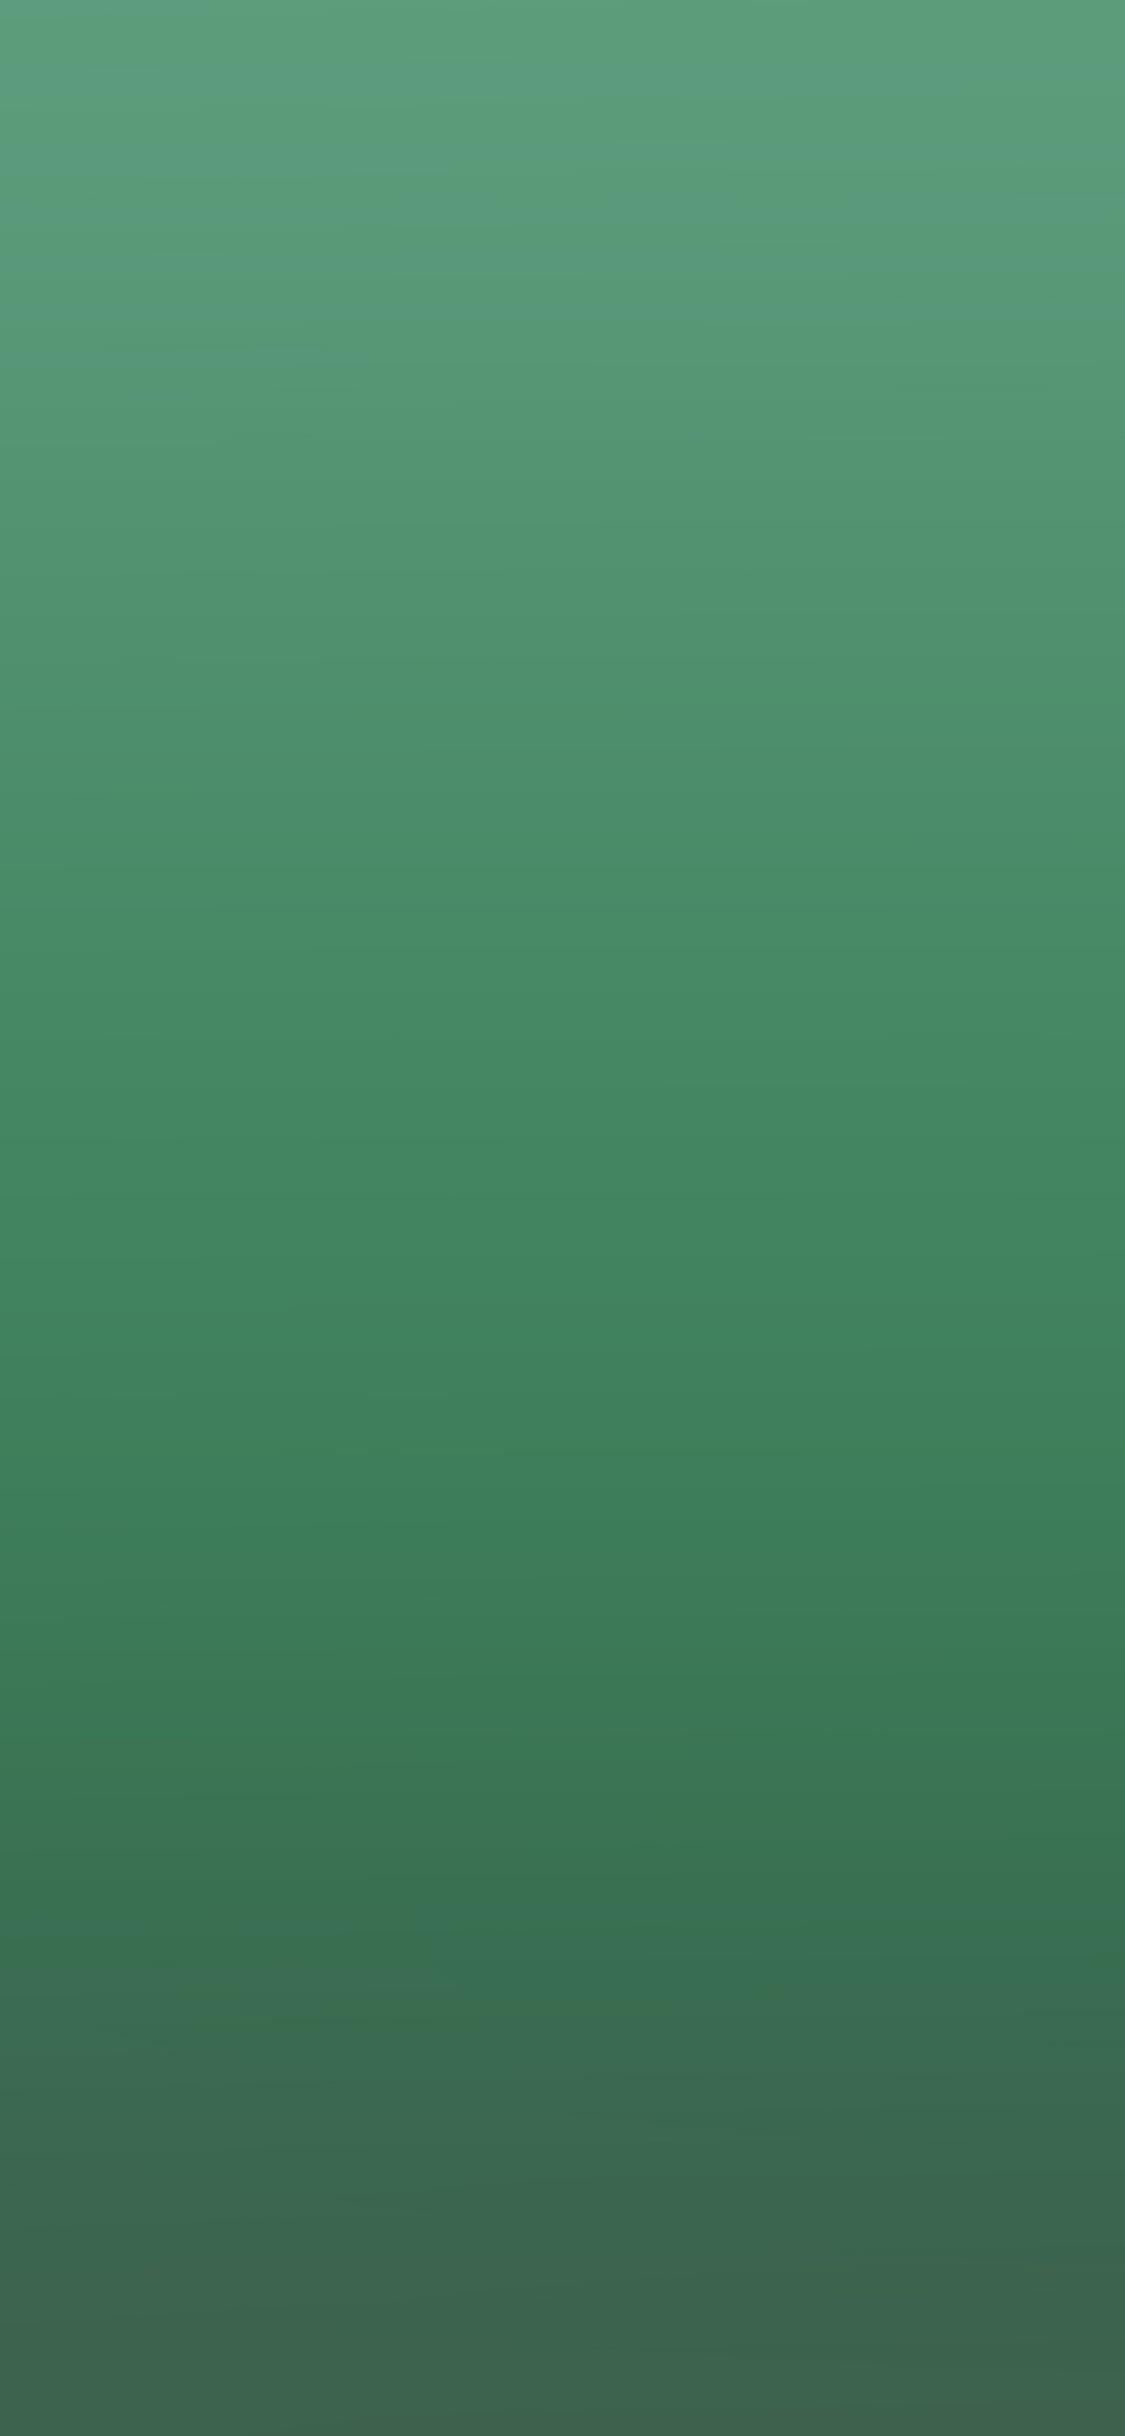 iPhoneXpapers.com-Apple-iPhone-wallpaper-si66-green-emerald-gradation-blur